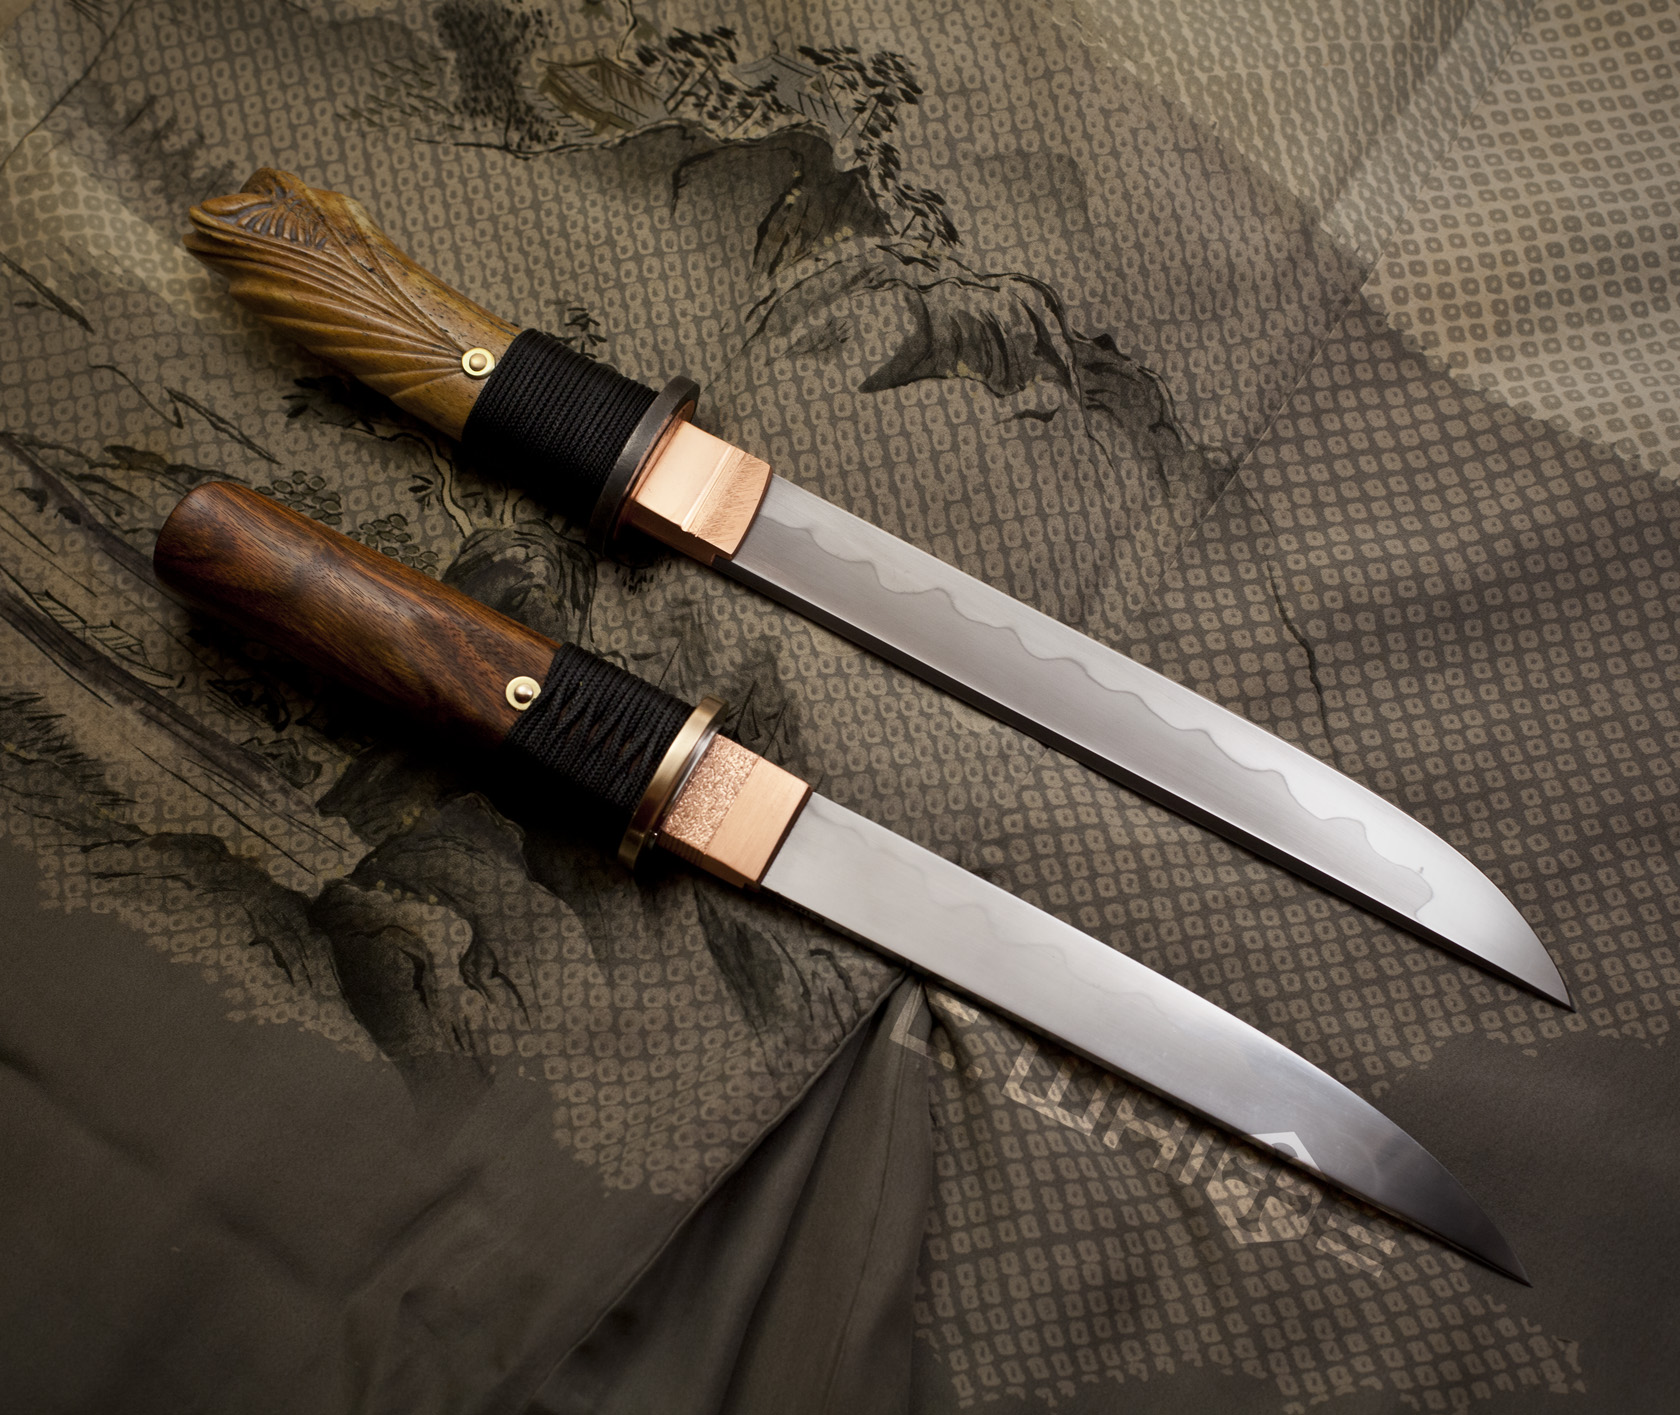 caleb-white-chechen-tanto-japanese-knife-handmade-caleb-white-otanto1.jpg